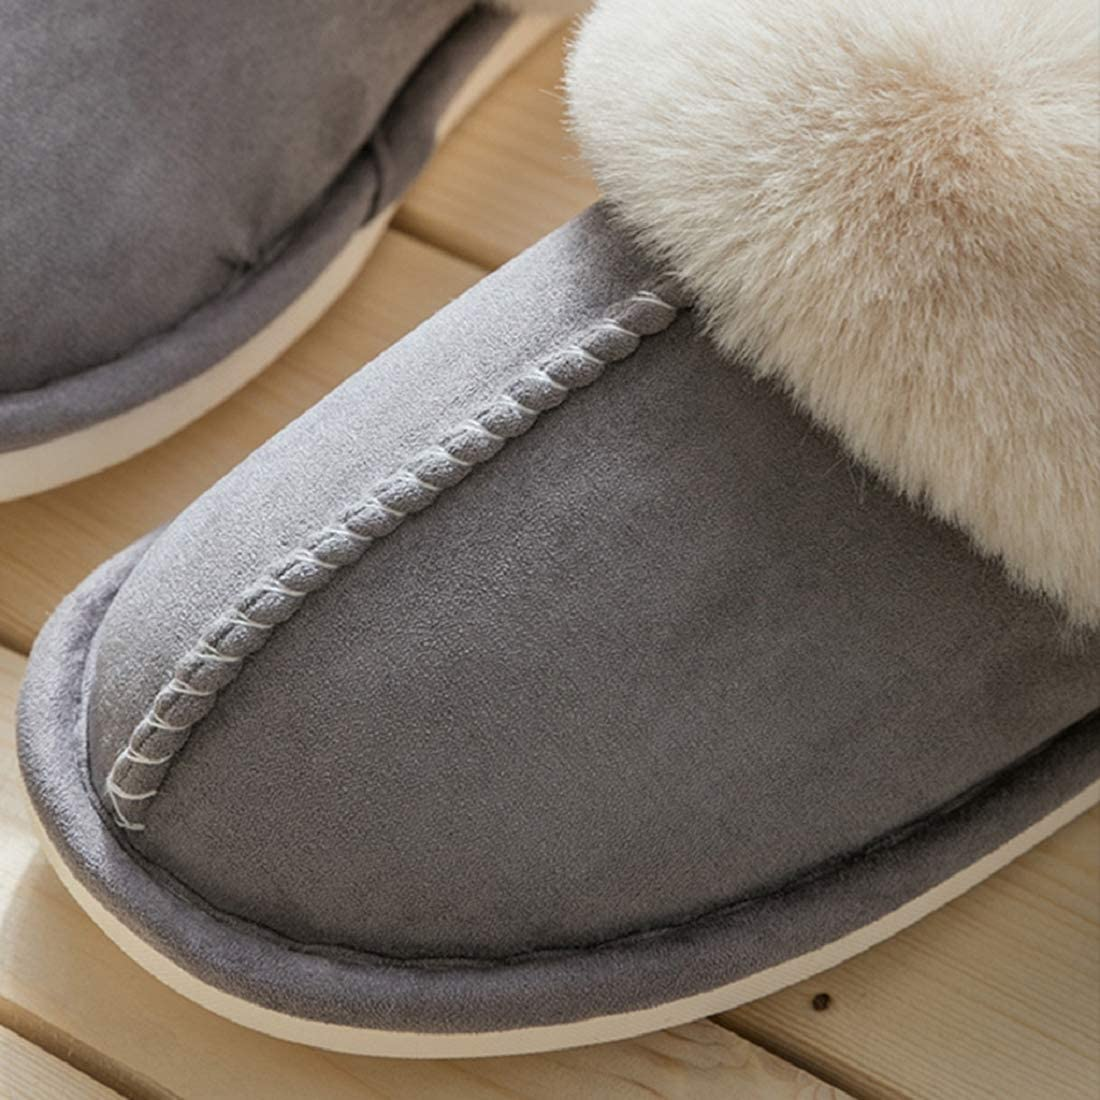 Womens Slipper Memory Foam Fluffy Soft Warm Slip On House Slippers,Anti-Skid Cozy Plush for Indoor Outdoor